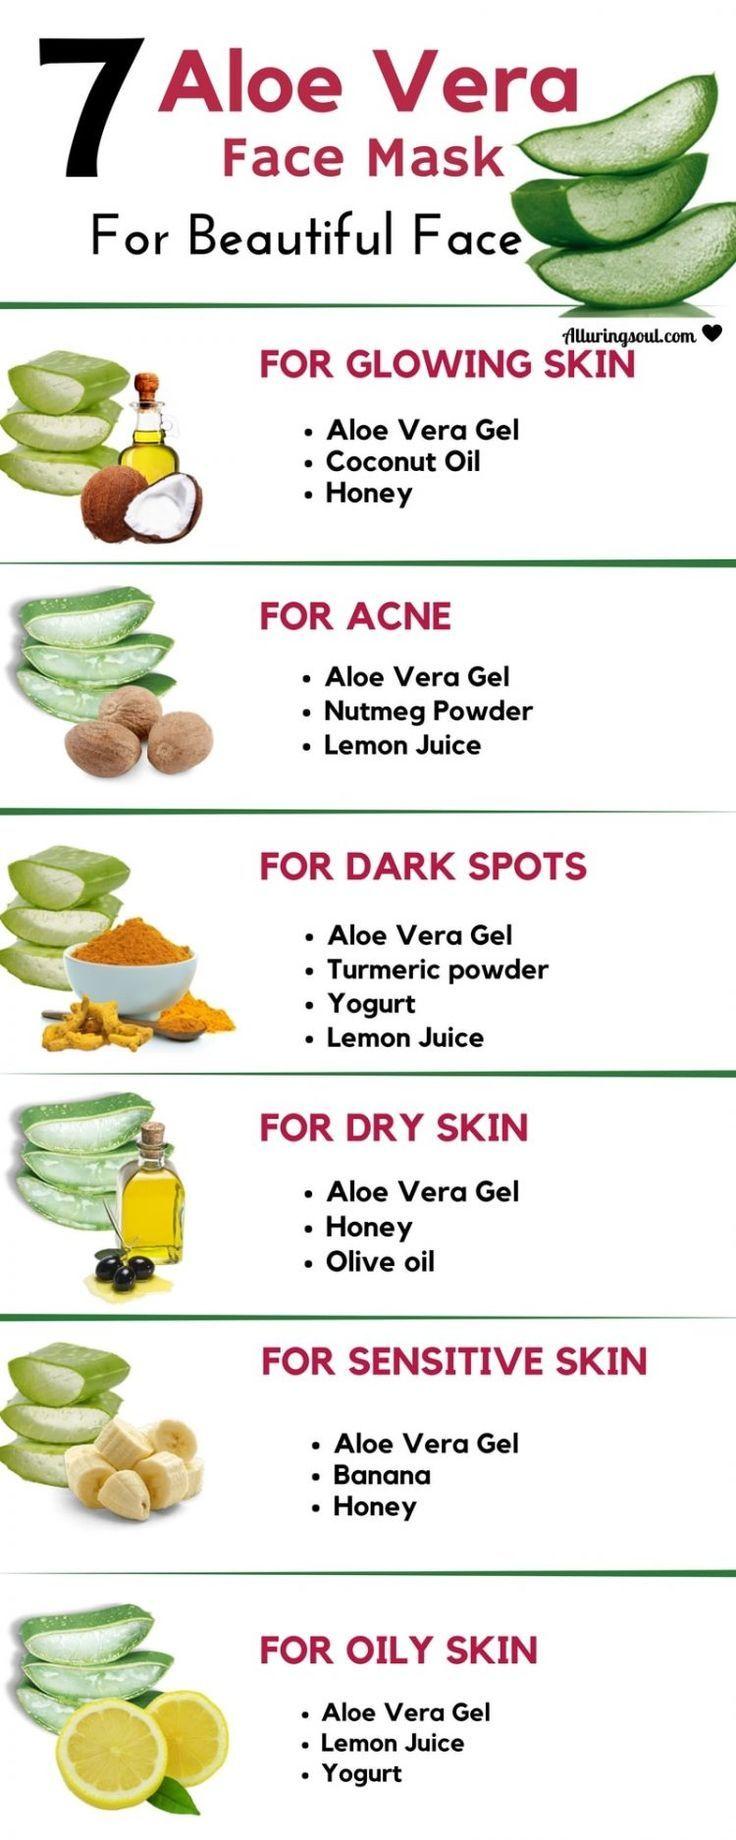 12 Aloe Vera Face Mask For Bright And Beautiful Skin  Alluring